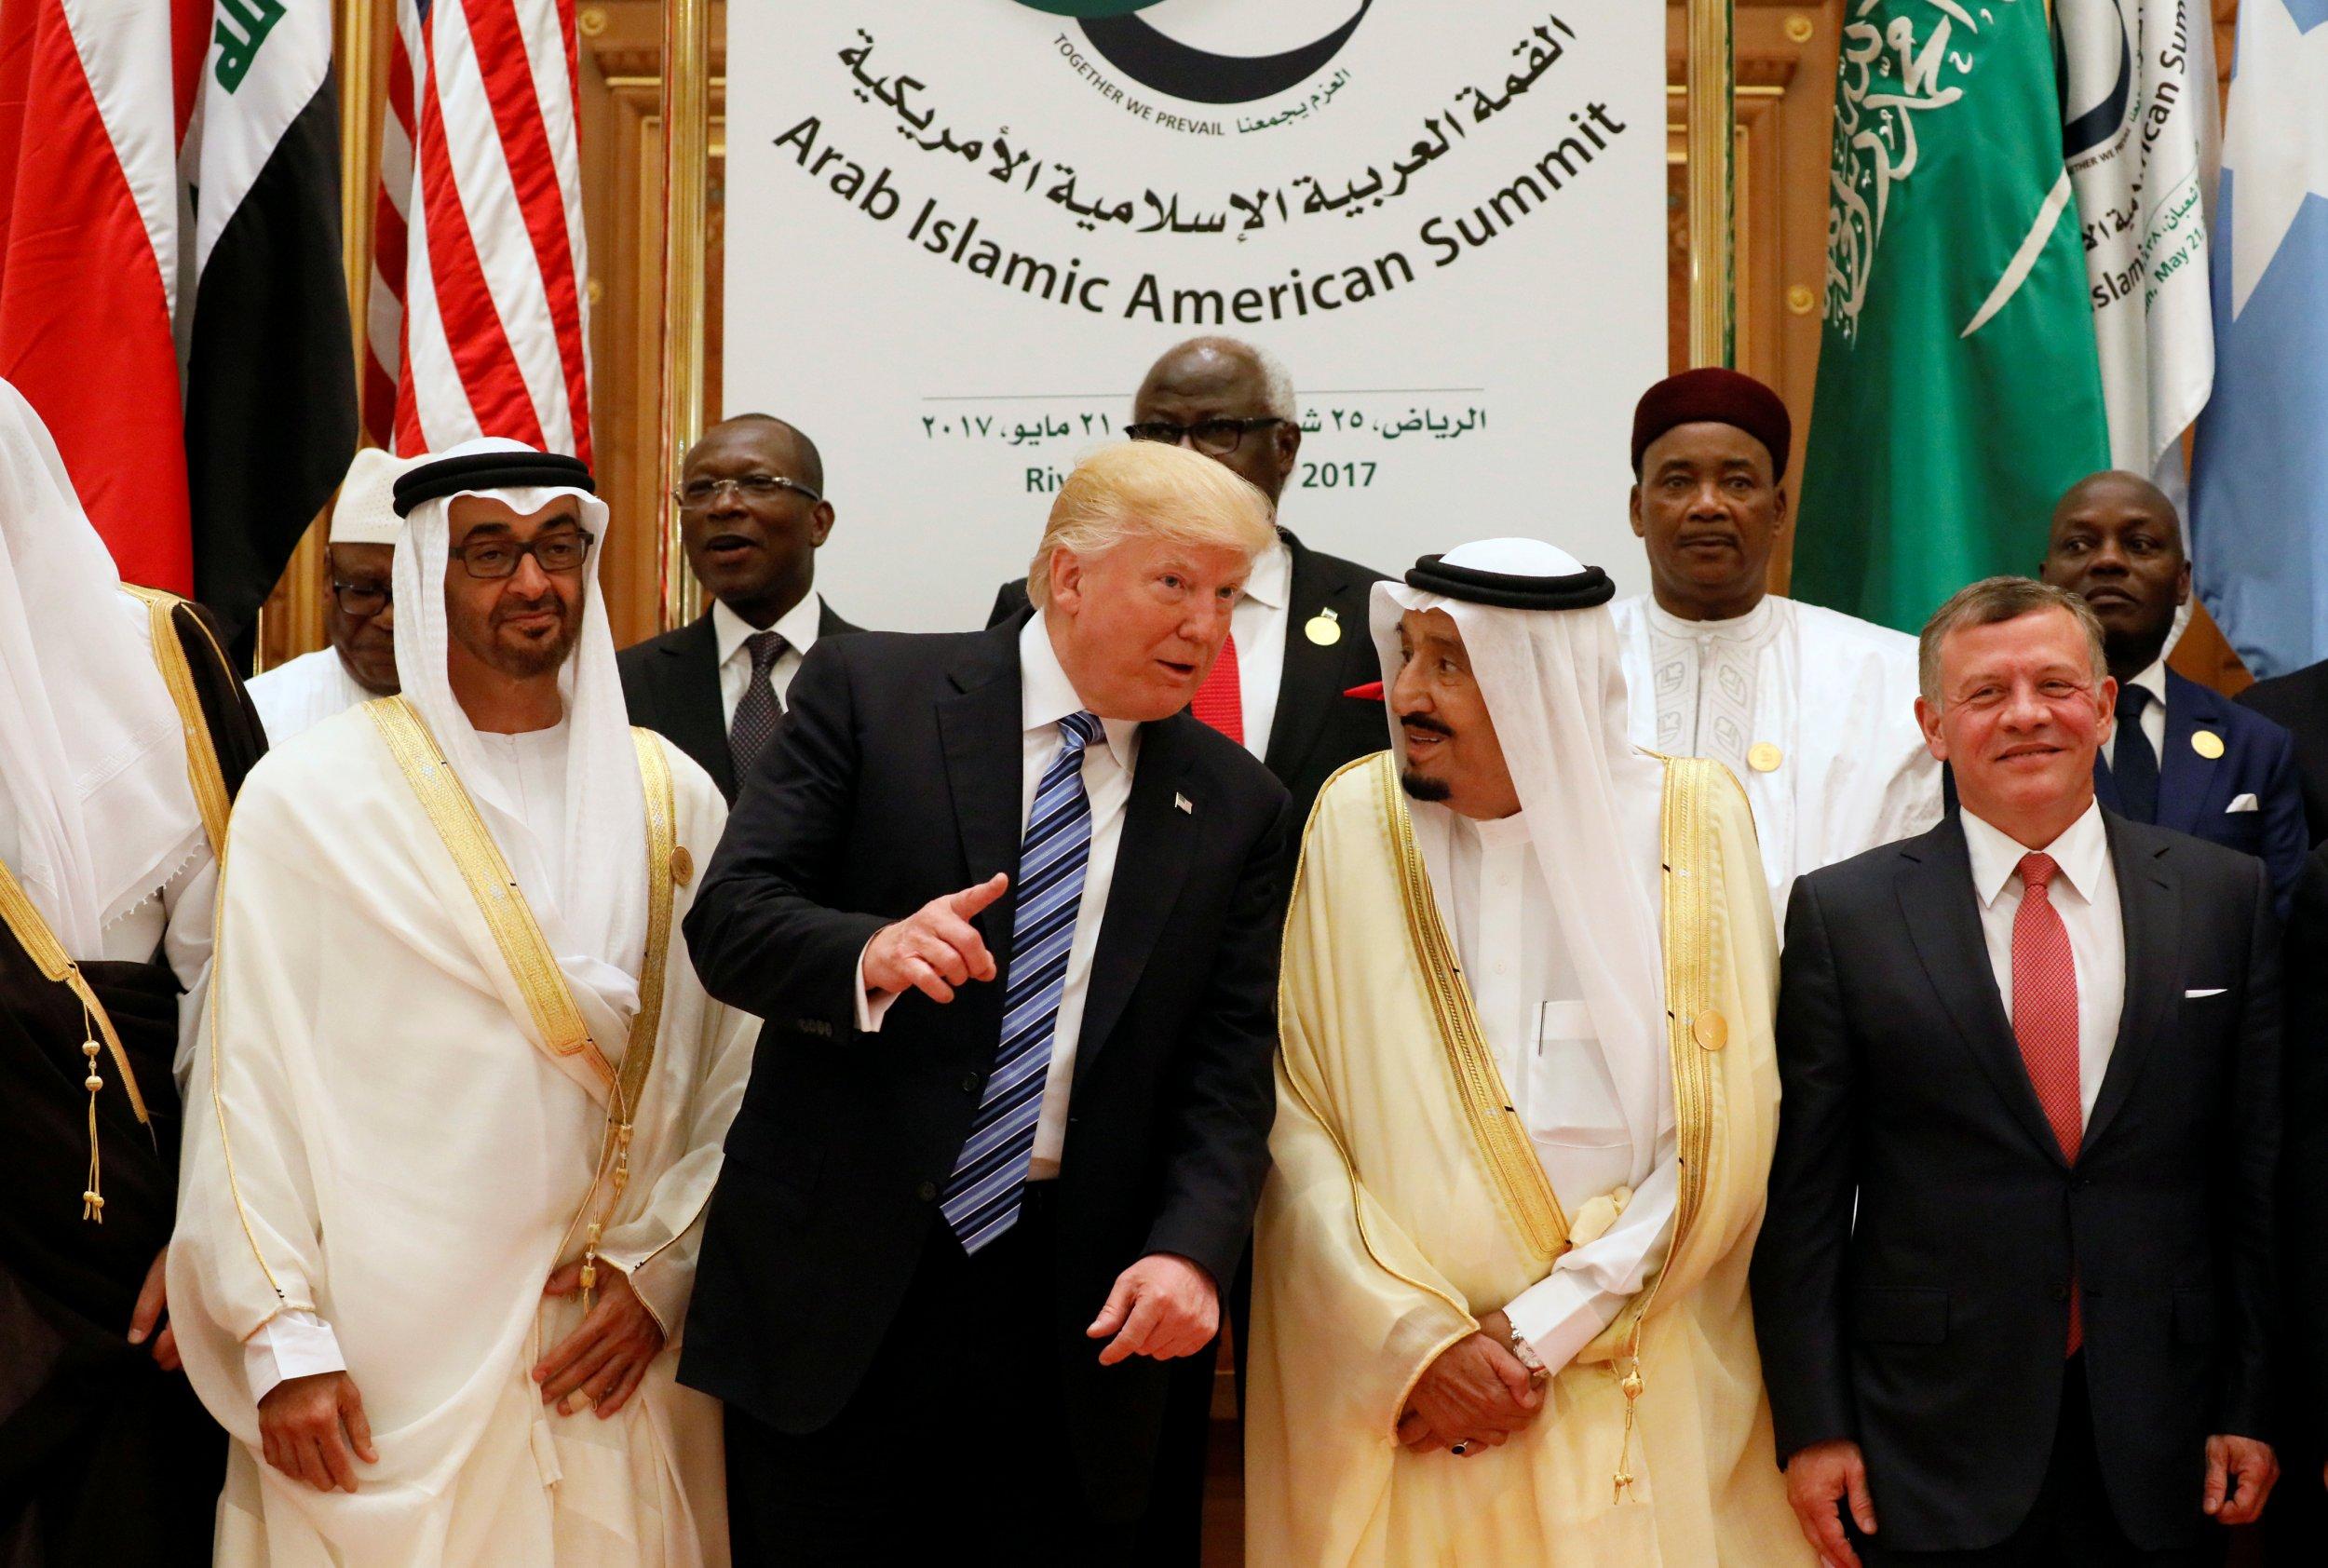 Image result for Donald Trump, in saudi Arabia, photos